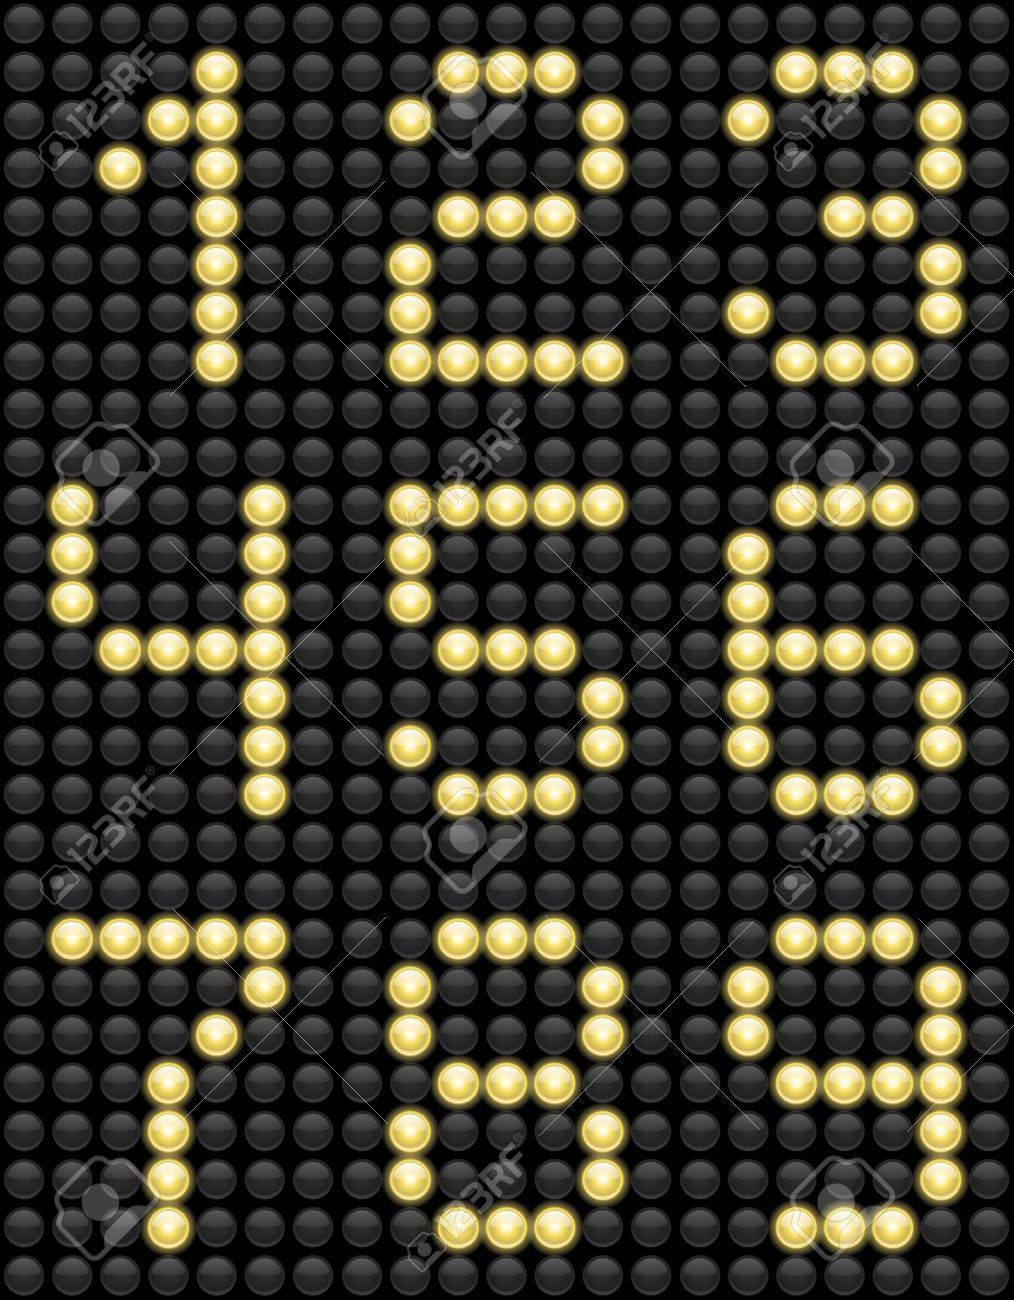 Light Bulb Lamps ABC alphabet Stock Vector - 18239905